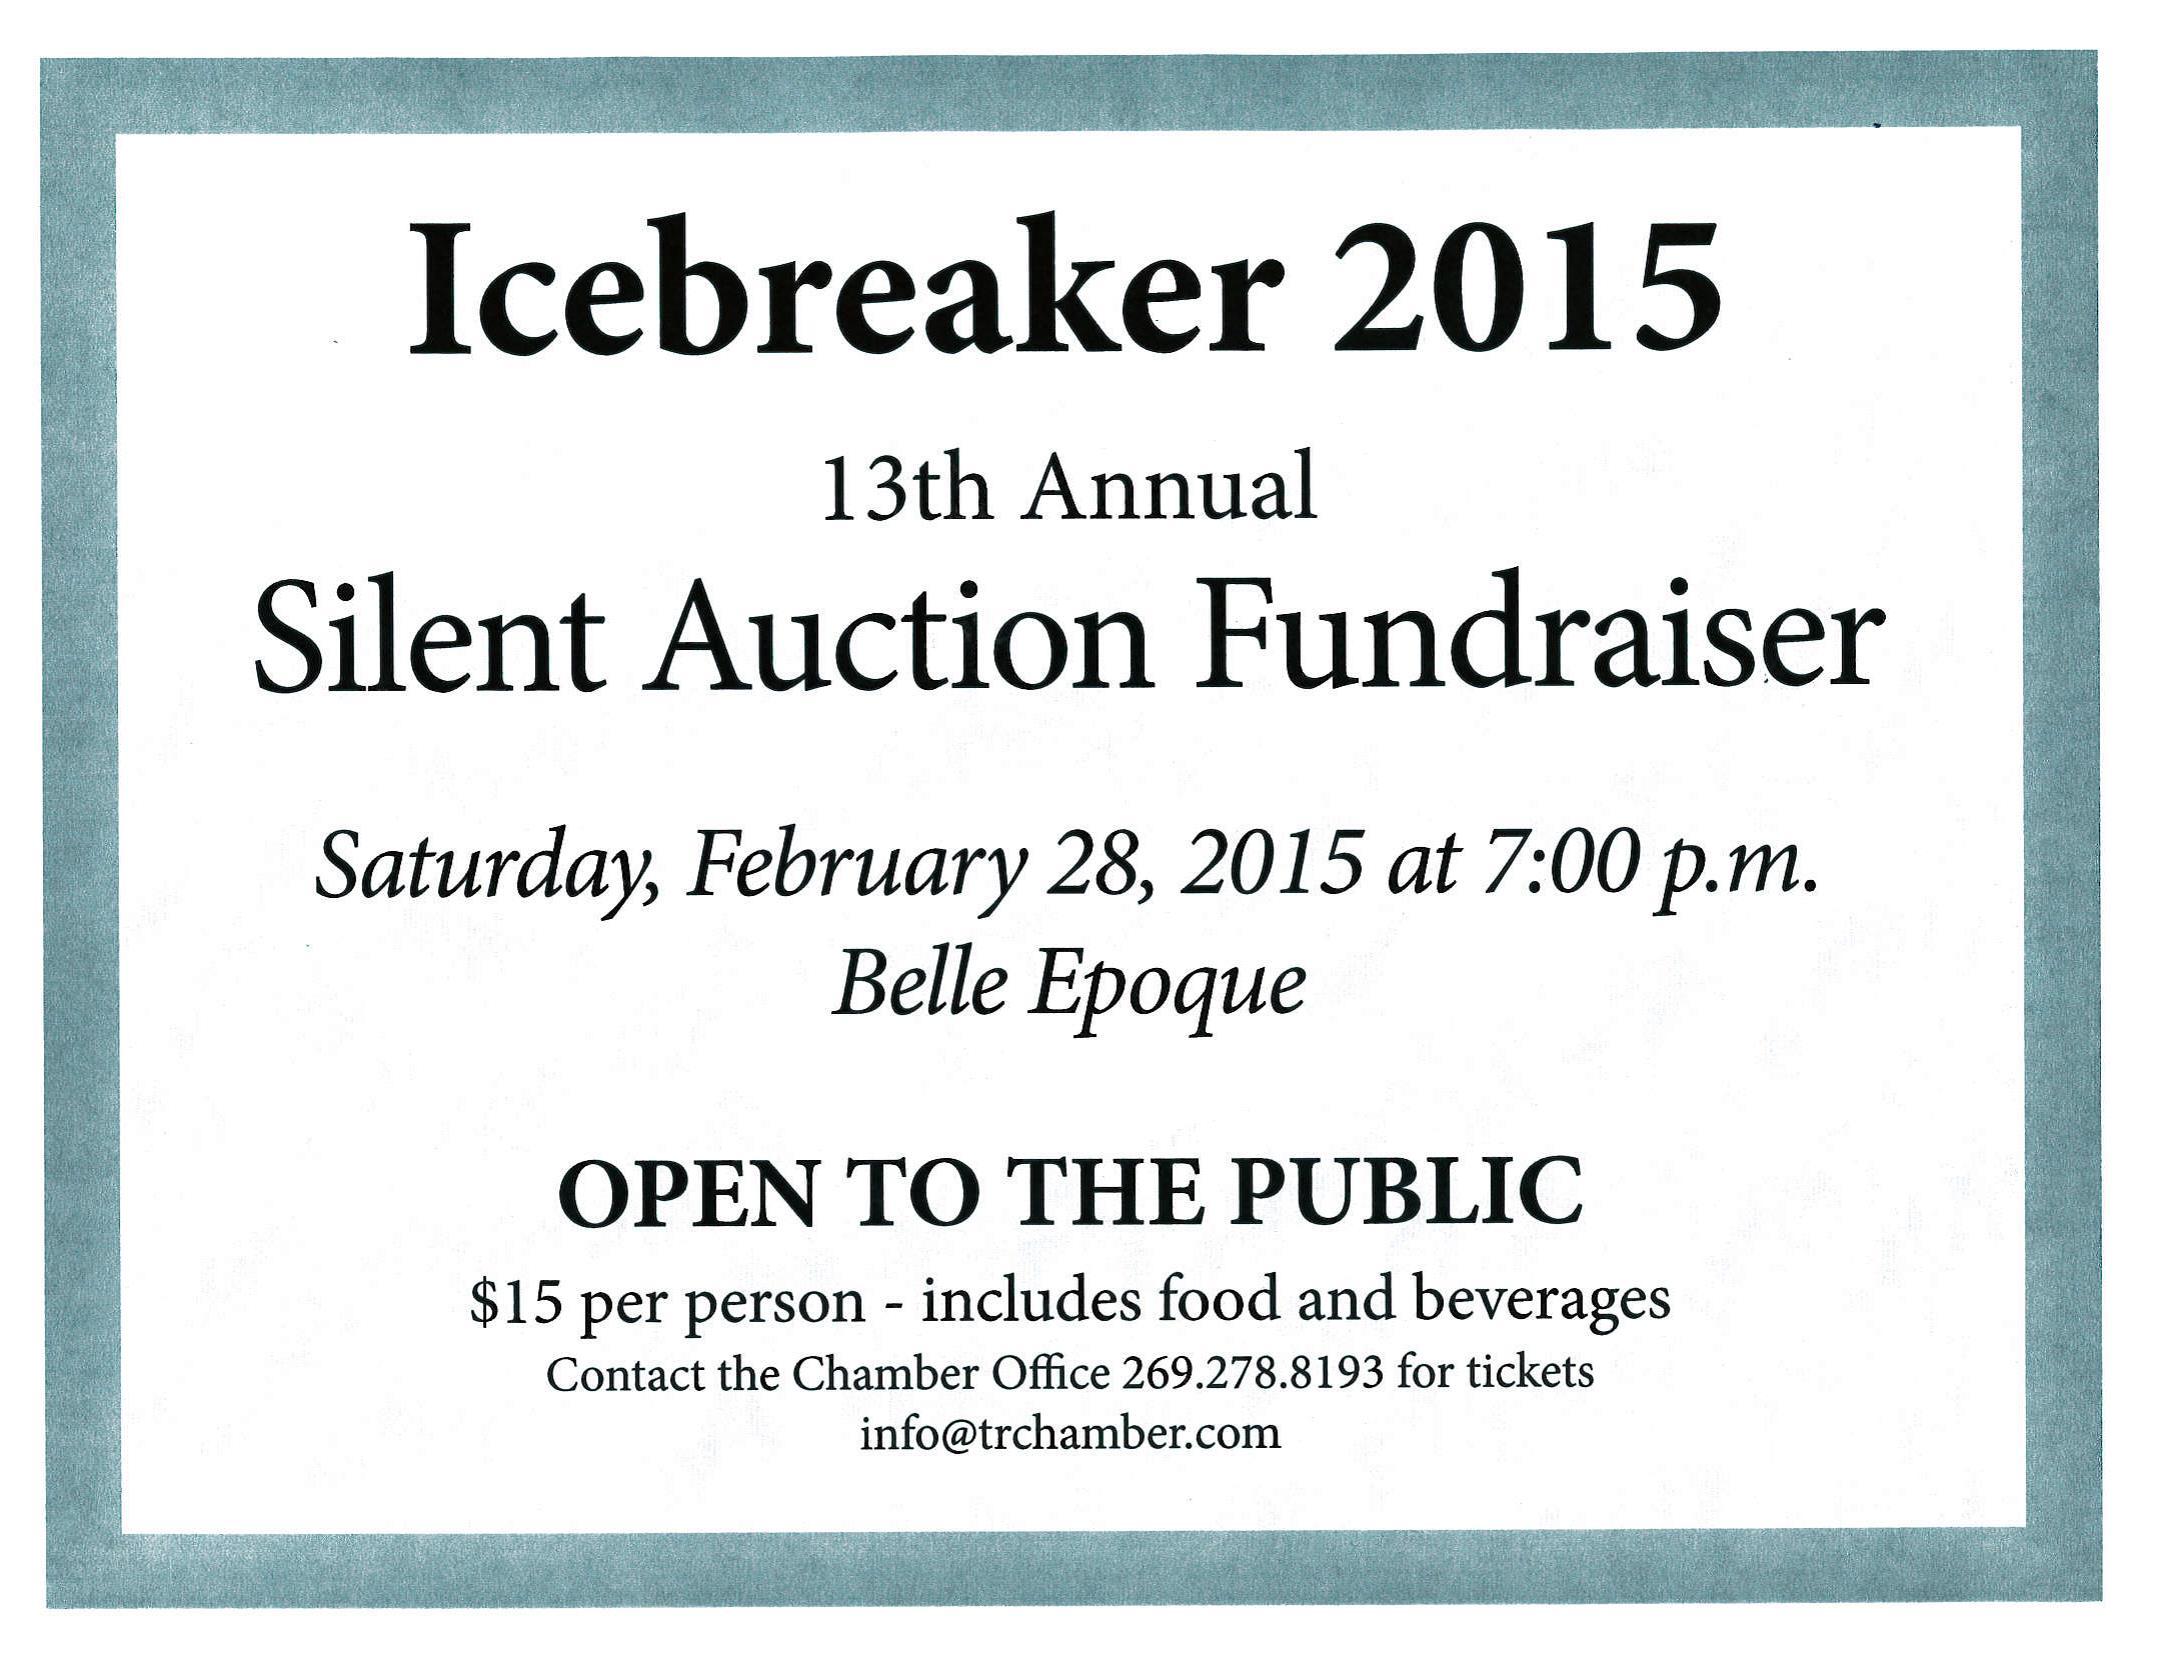 Ice Breaker 2015